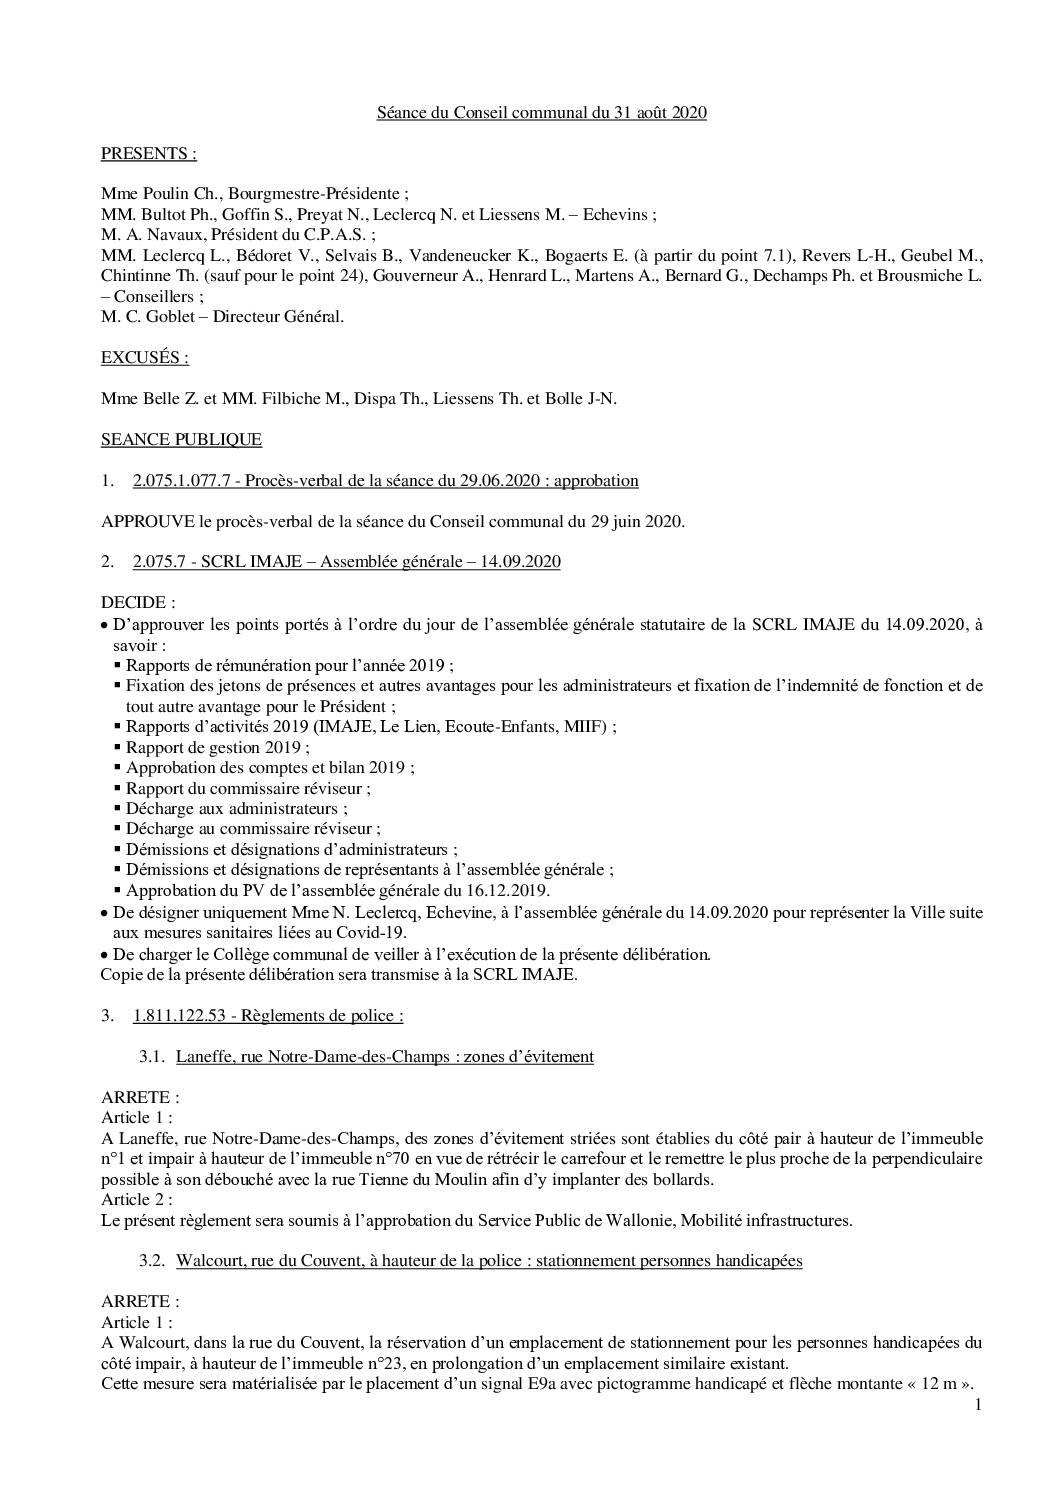 Conseil communal – 31 août 2020